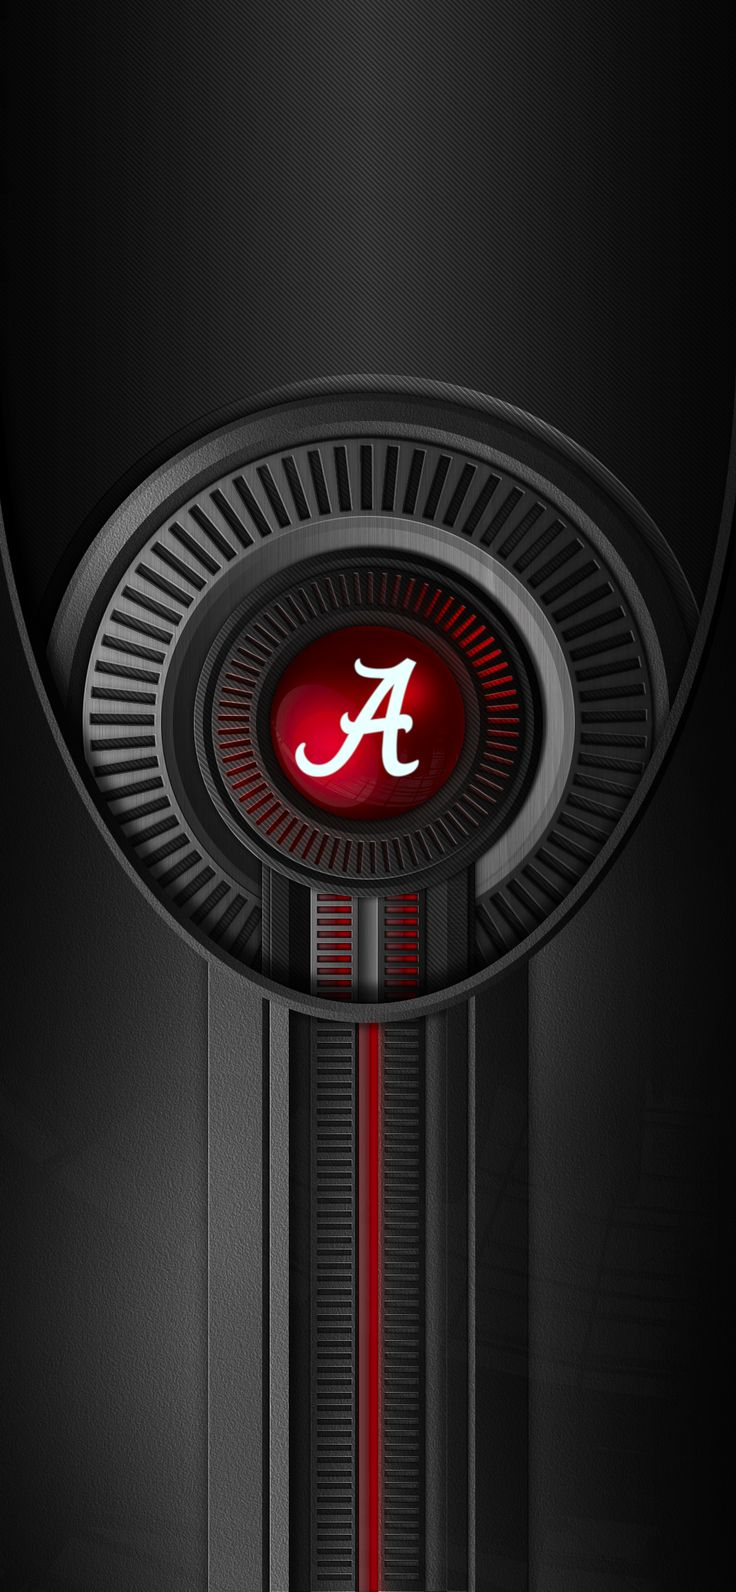 Alabama Crimson Tide Football logo iPhone wallpaper (With